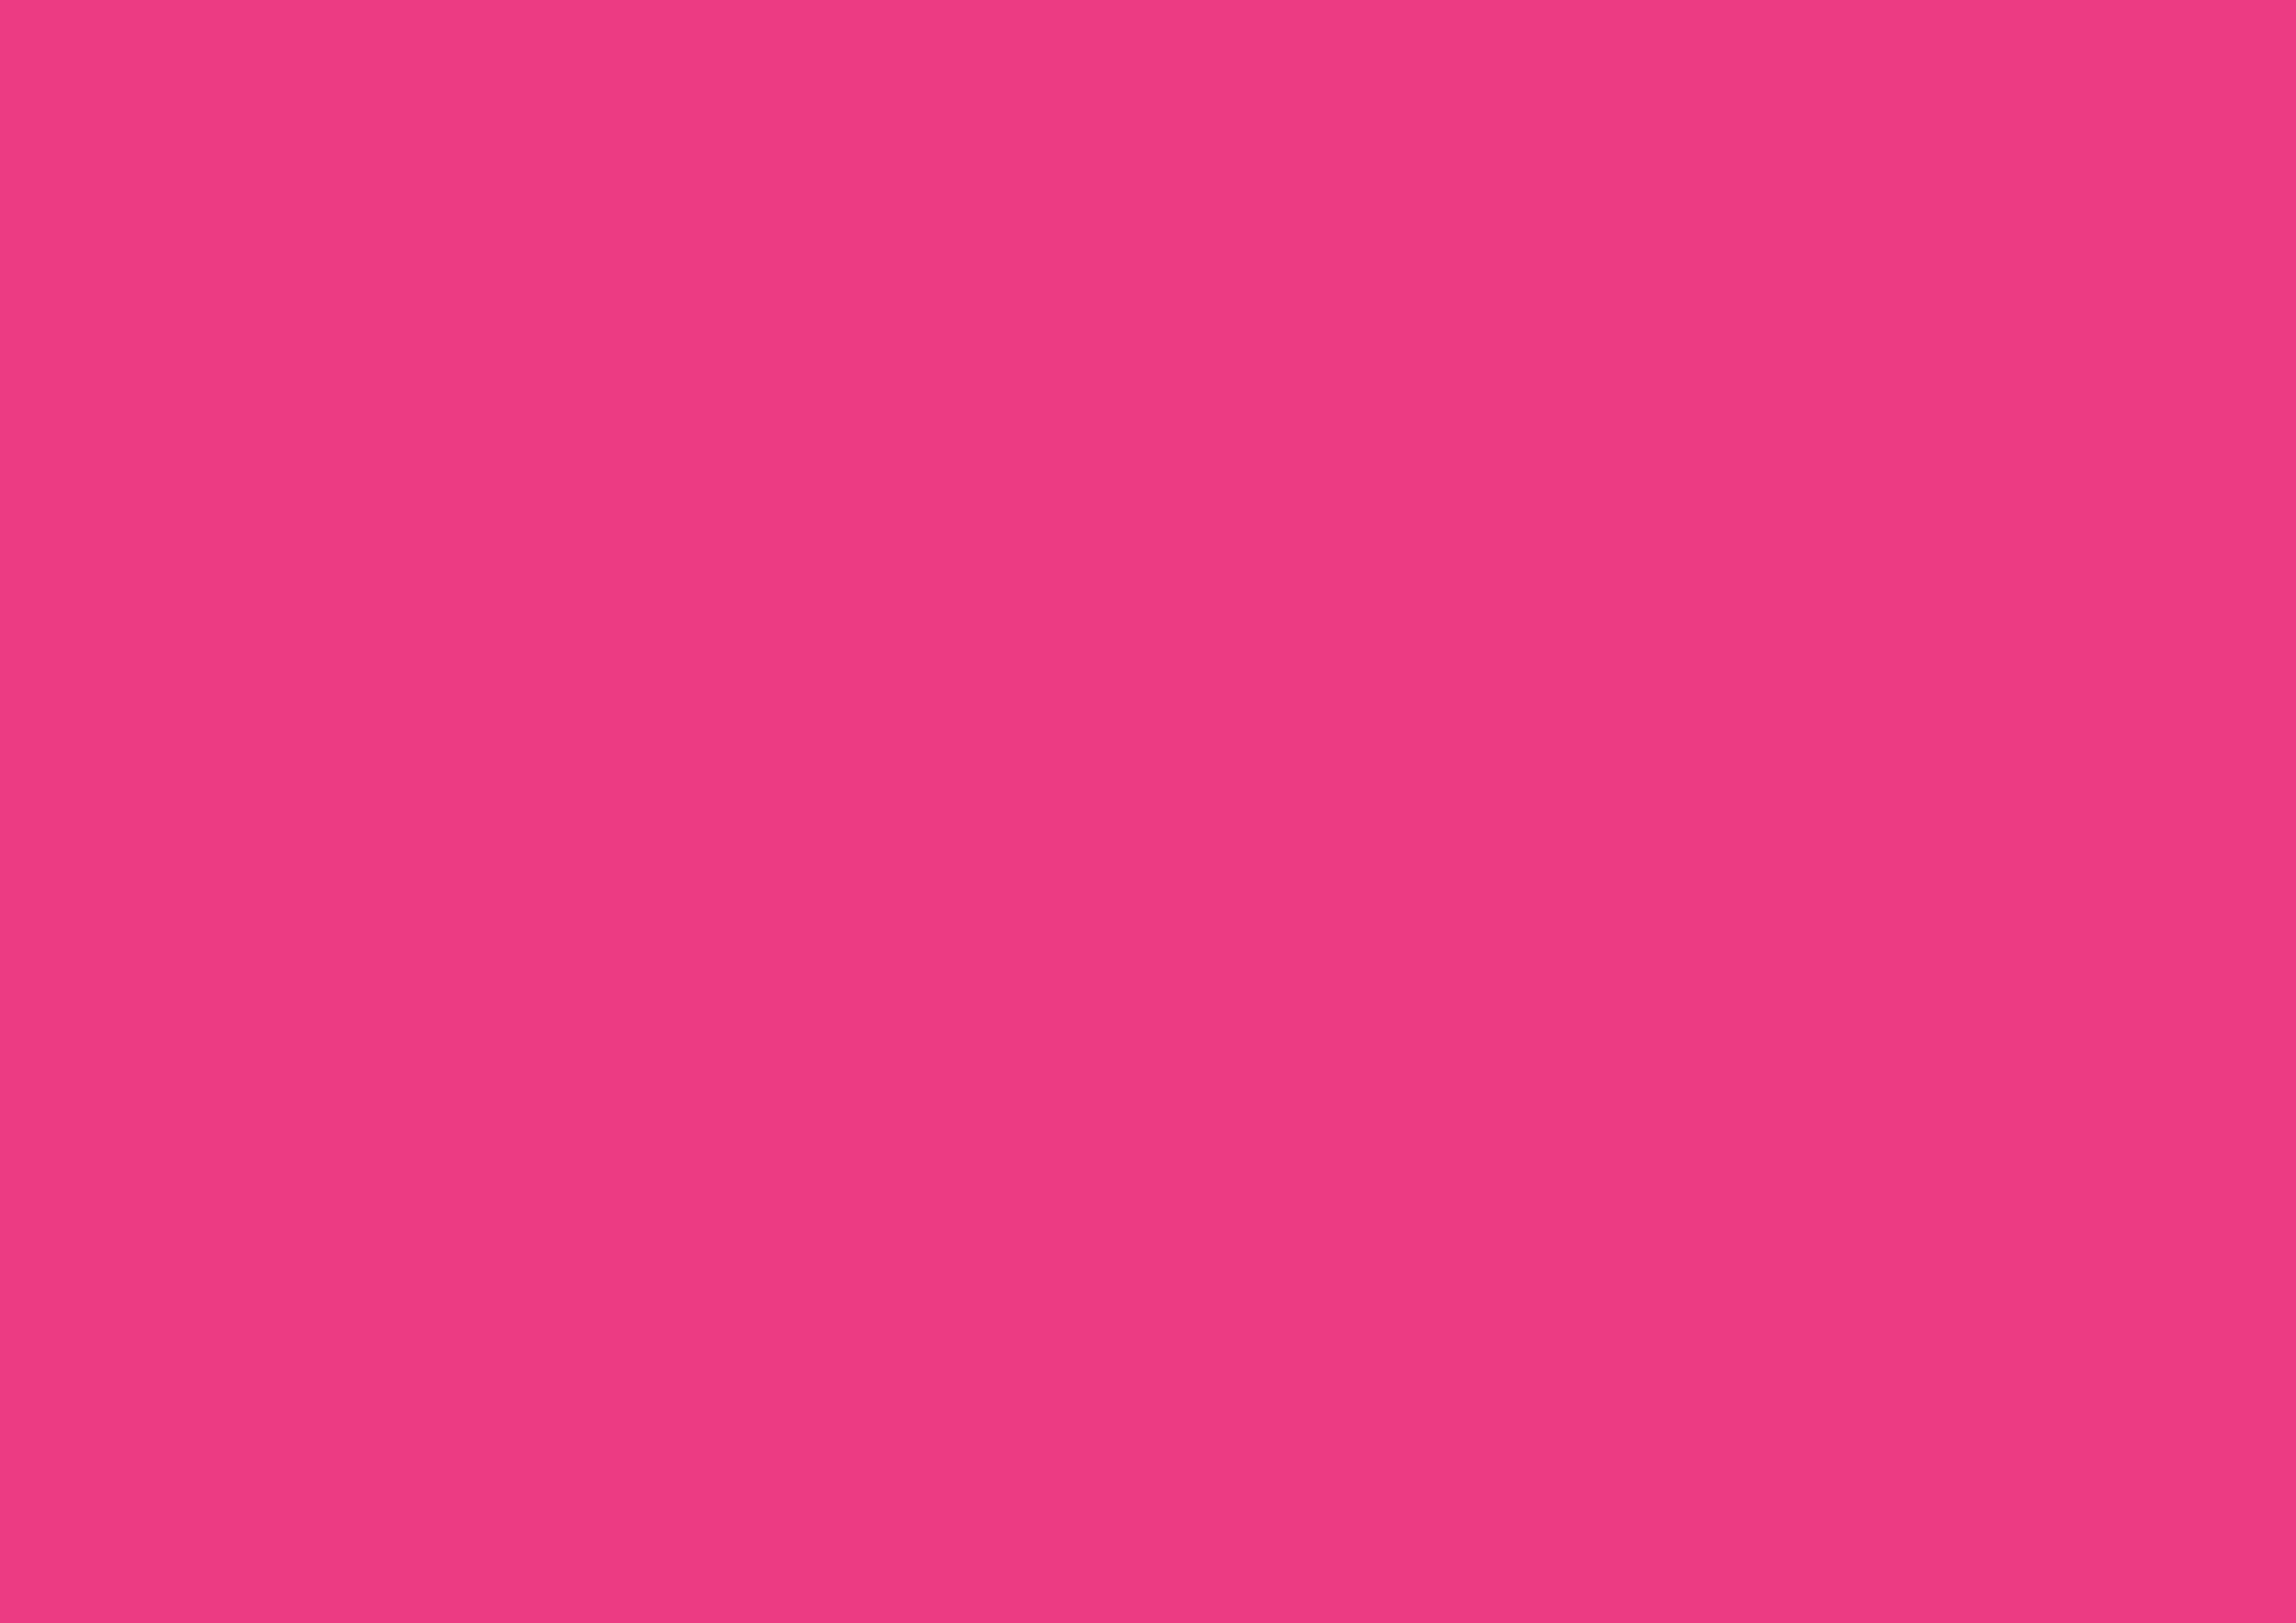 3508x2480 Cerise Pink Solid Color Background